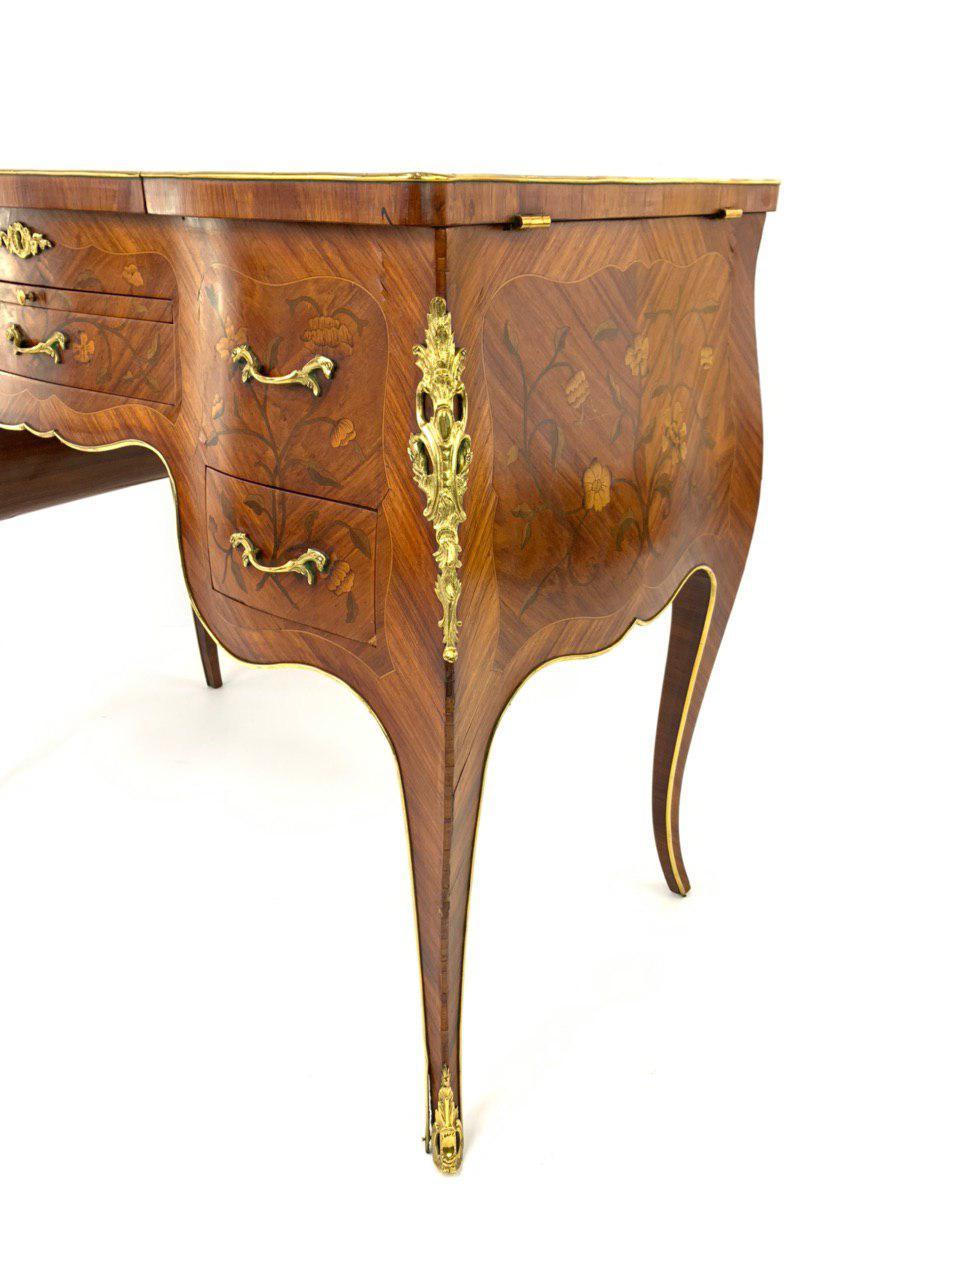 Дамский туалетный столик в стиле Луи XV